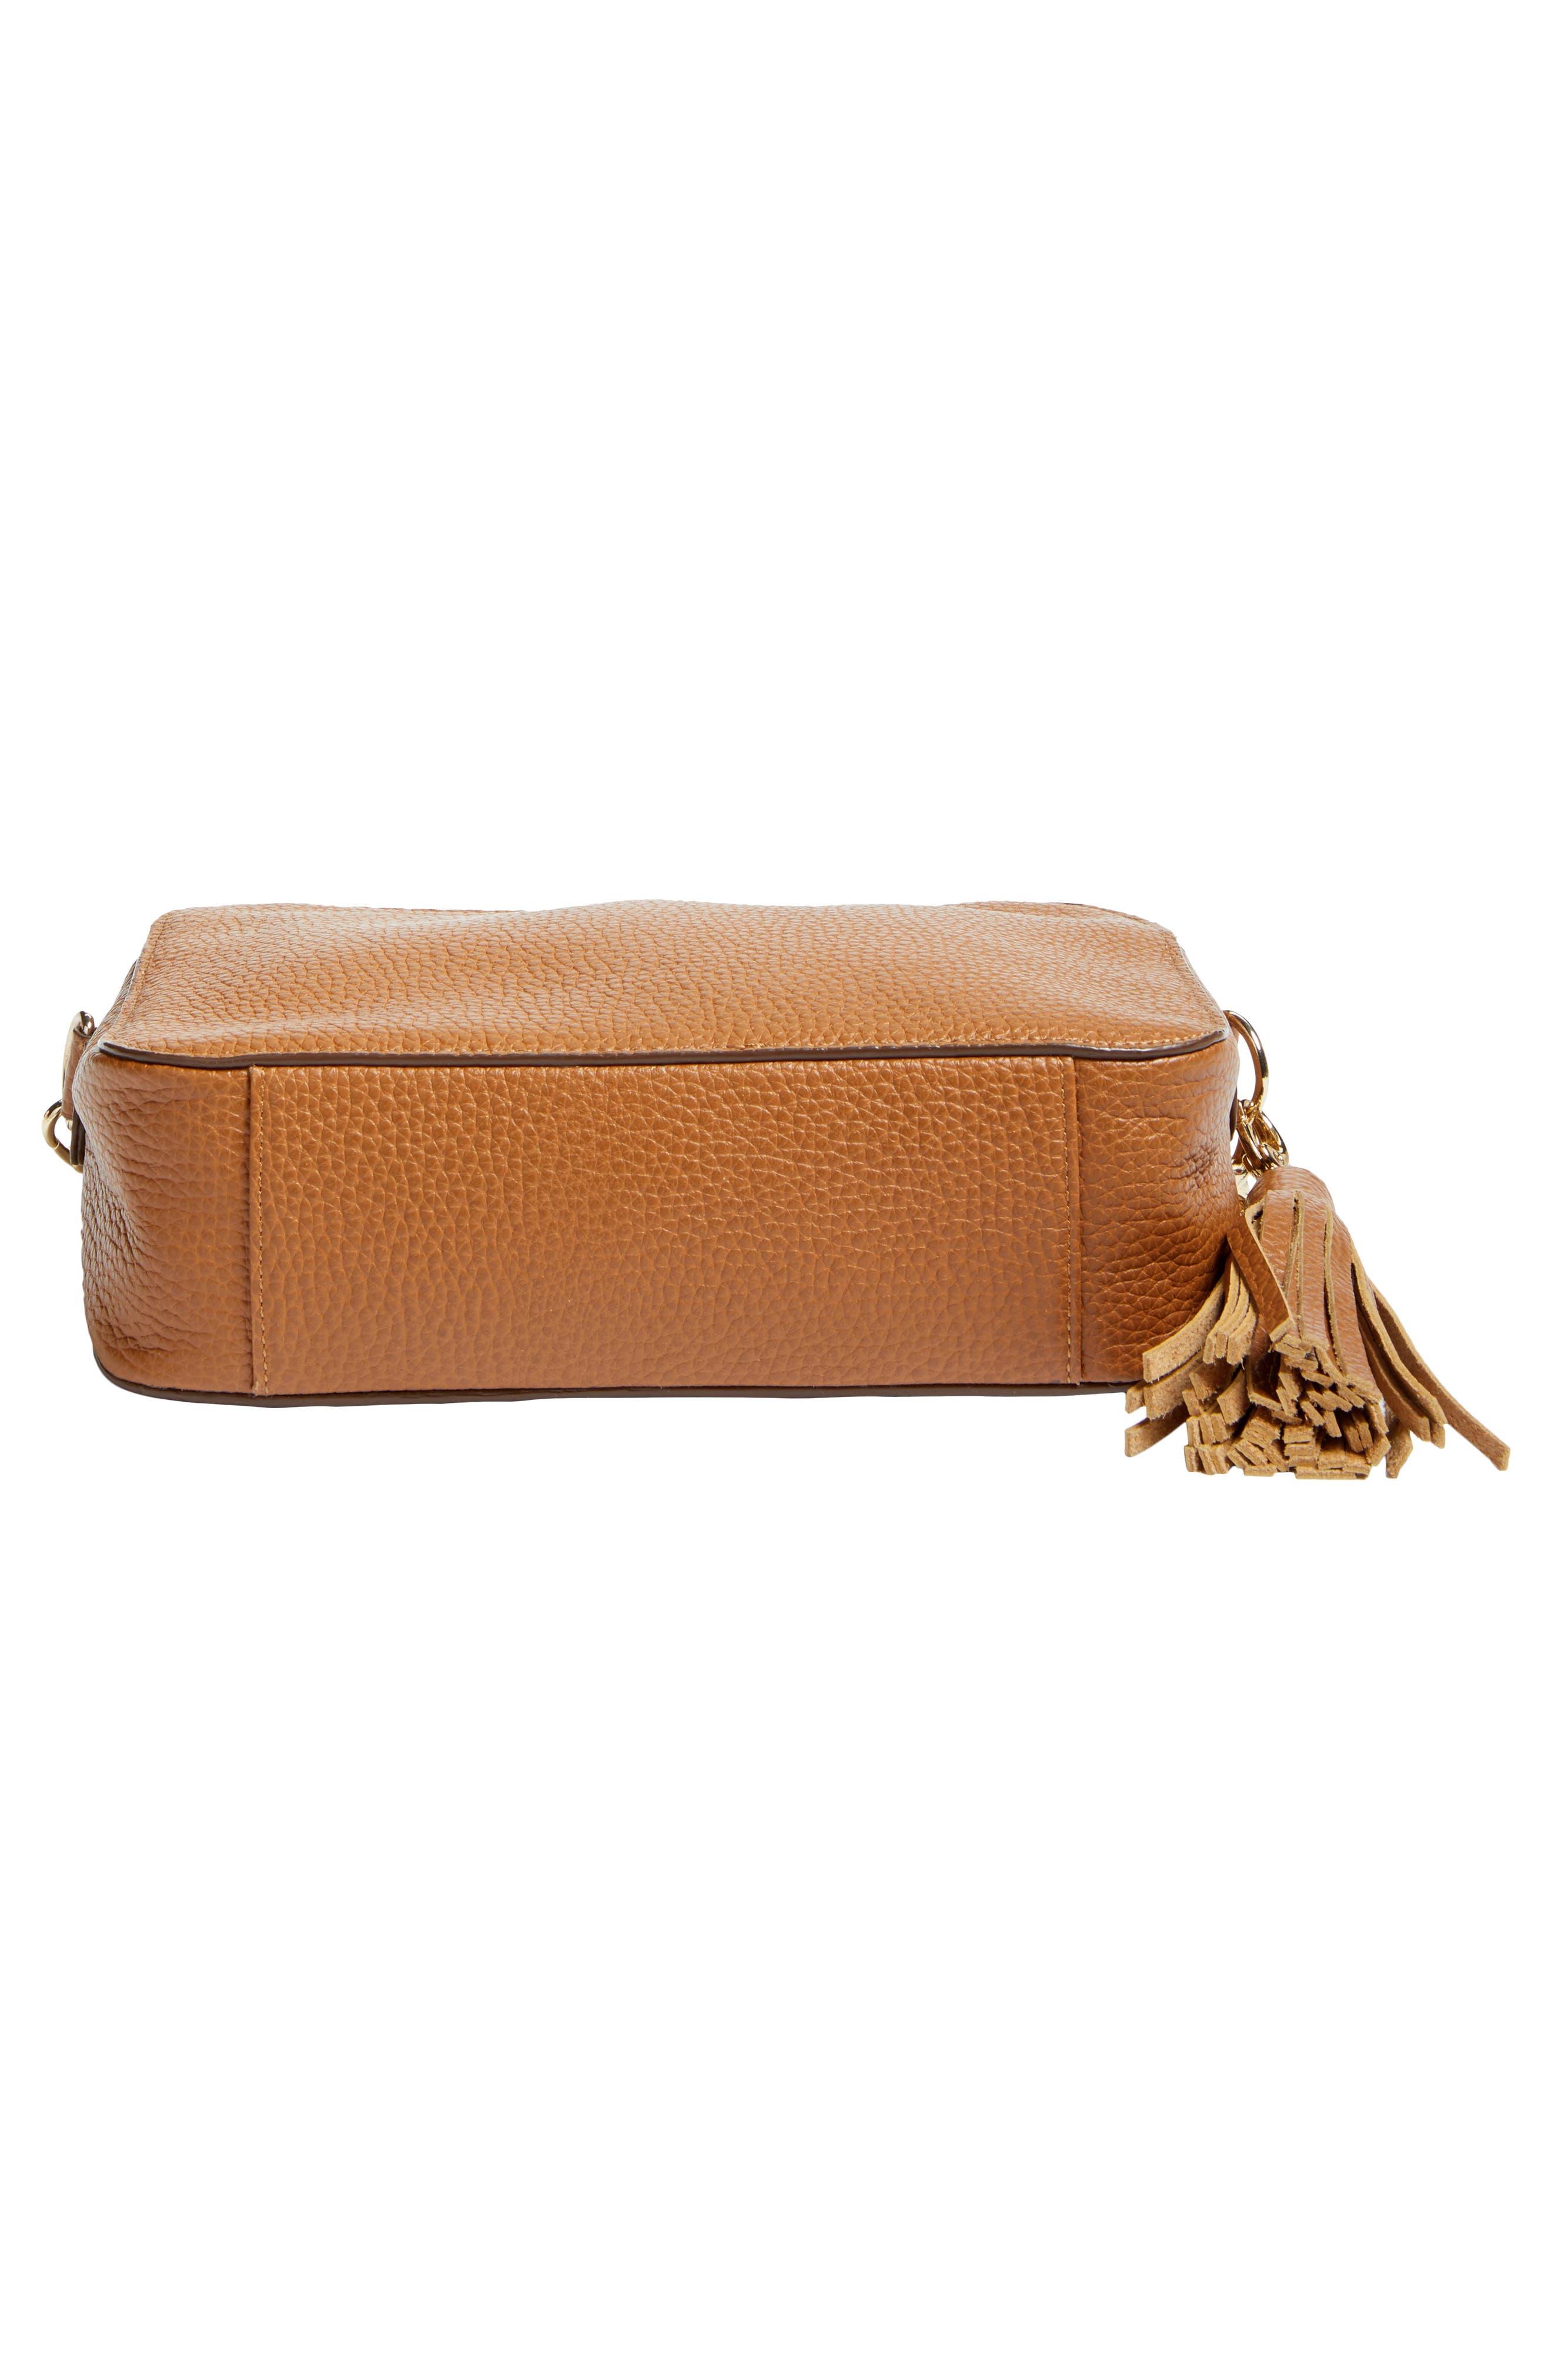 Ella Tassel Leather Crossbody Bag,                             Alternate thumbnail 6, color,                             Tan Spice